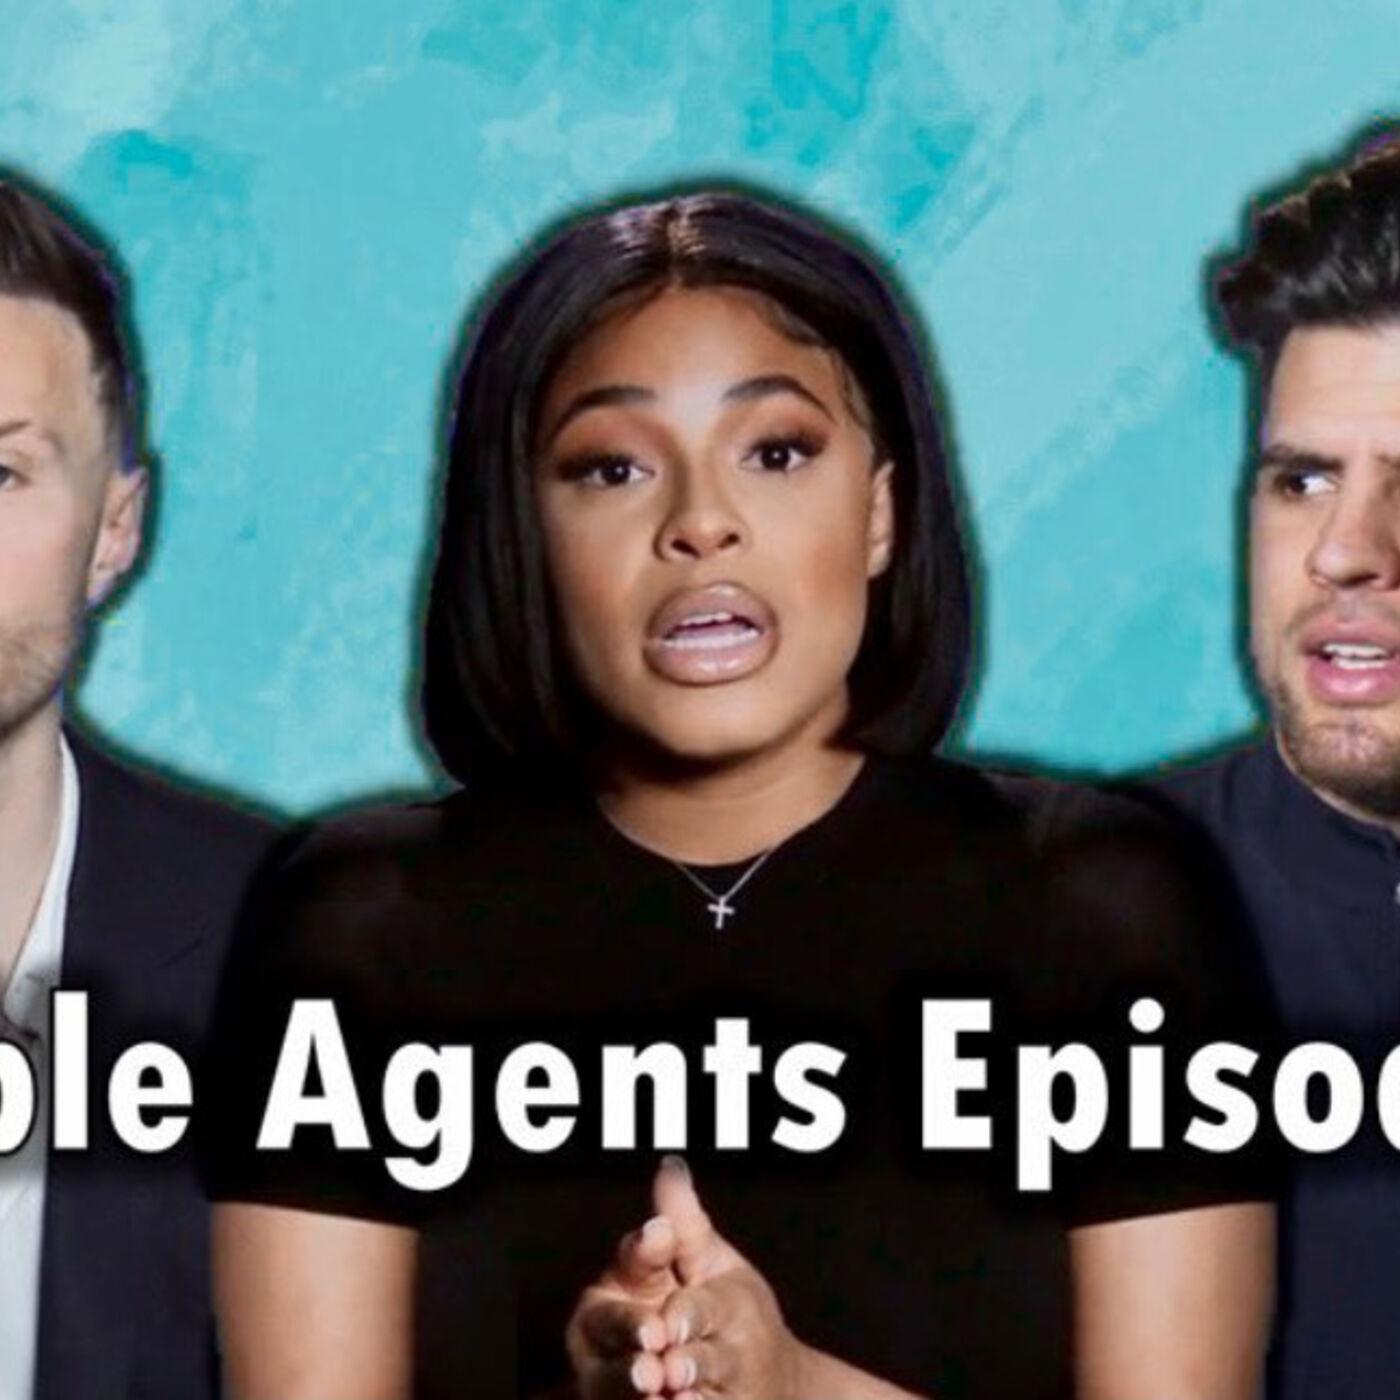 The Challenge Double Agents Episode 17 Recap: